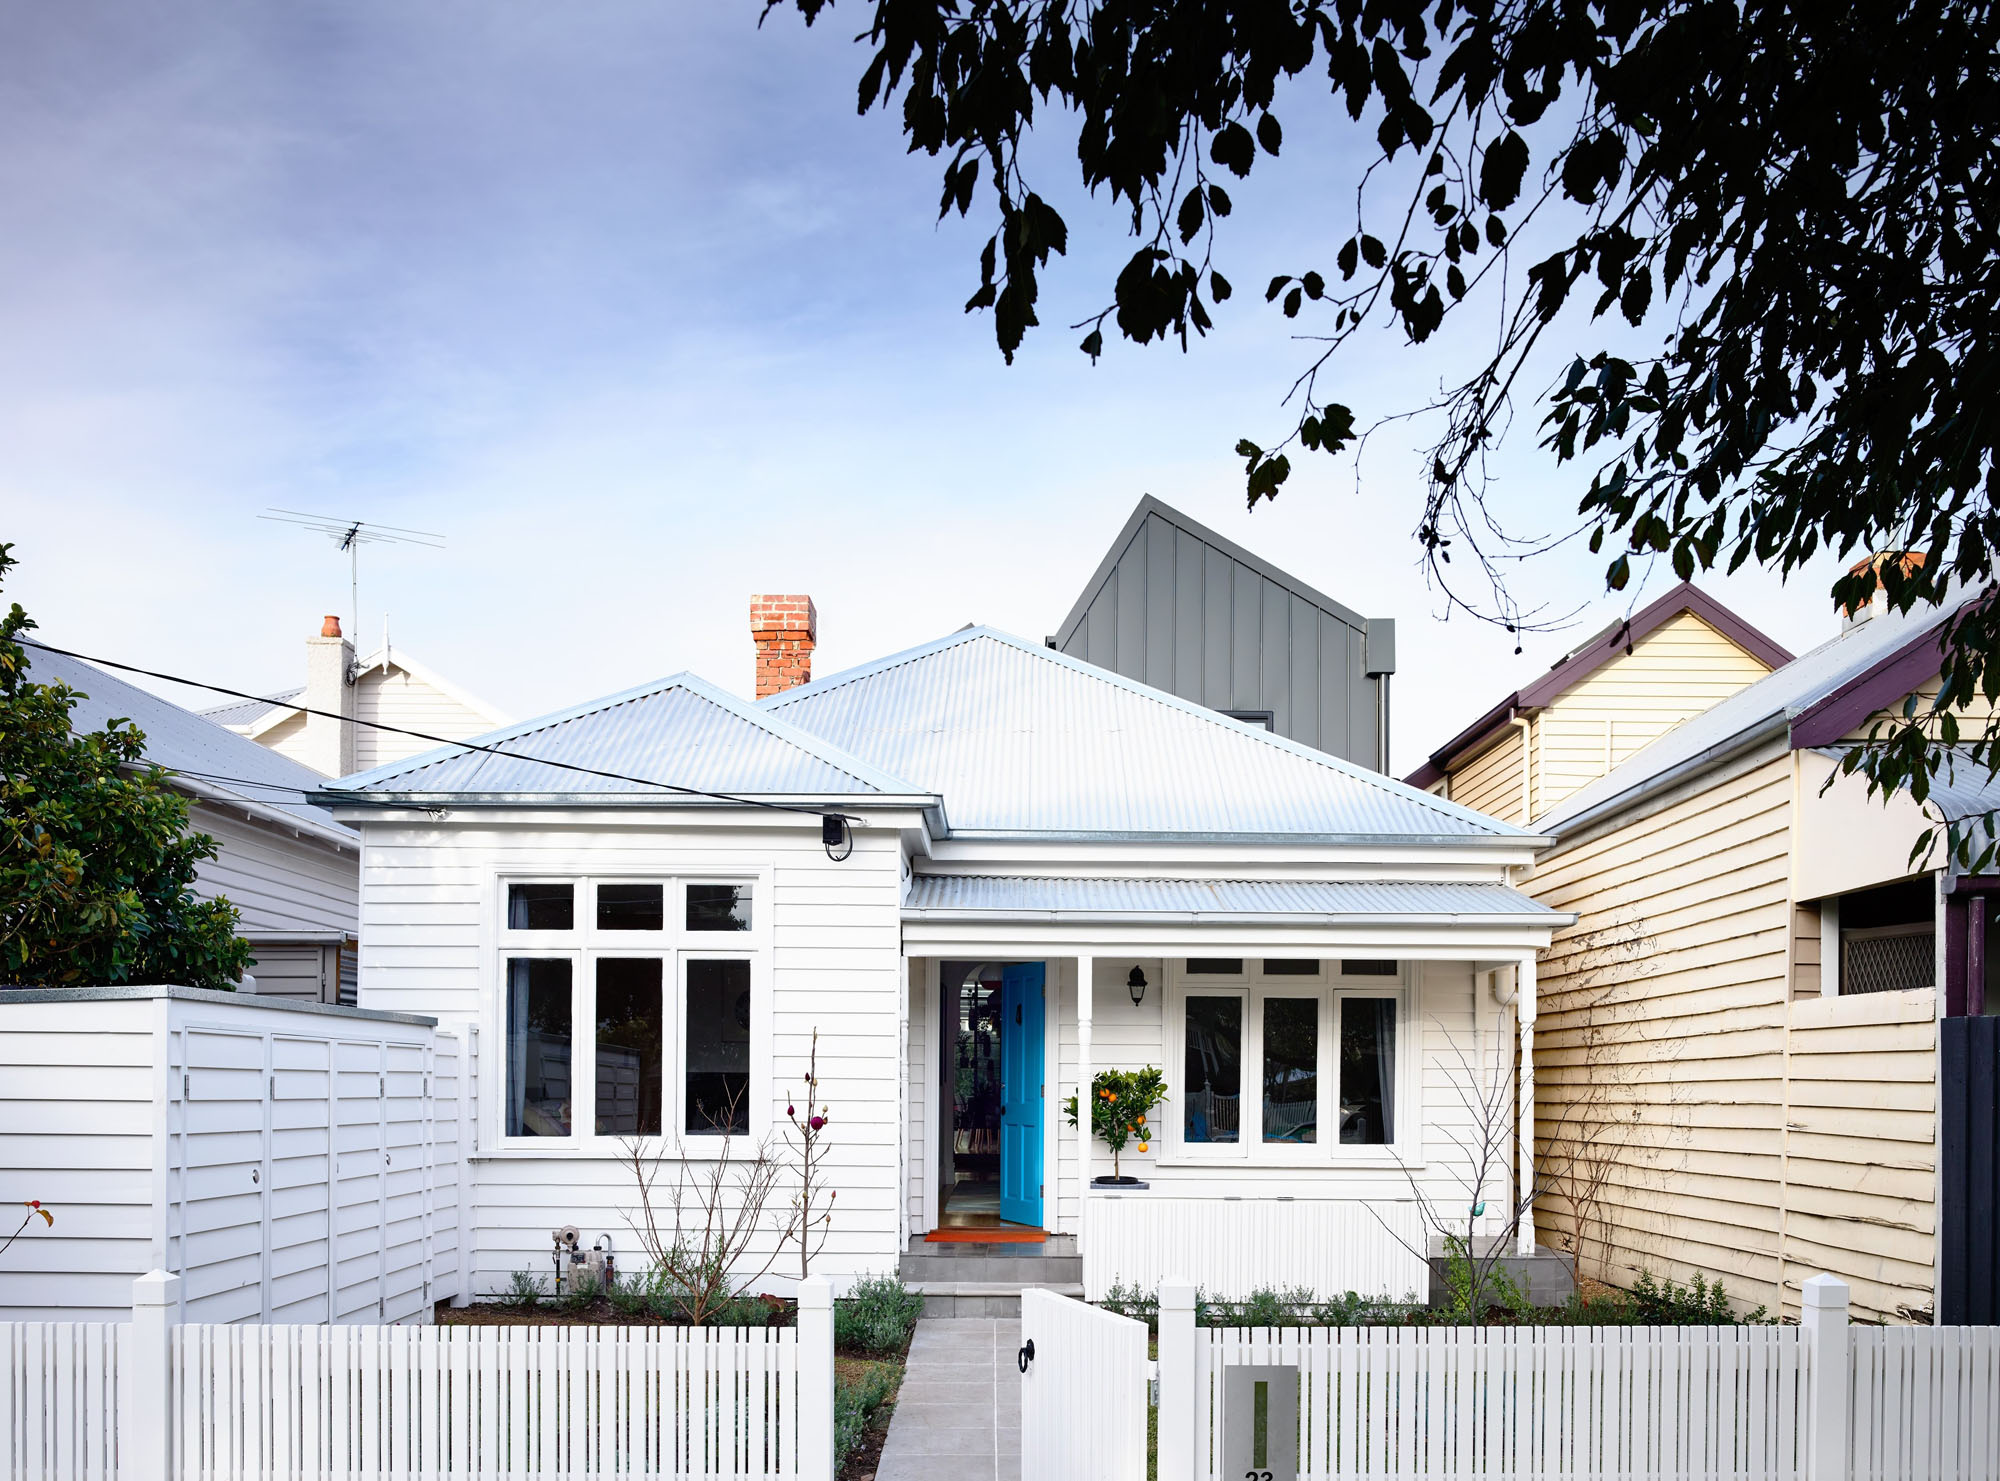 Casa de campo reconstruida como un hogar divertido y moderno 1